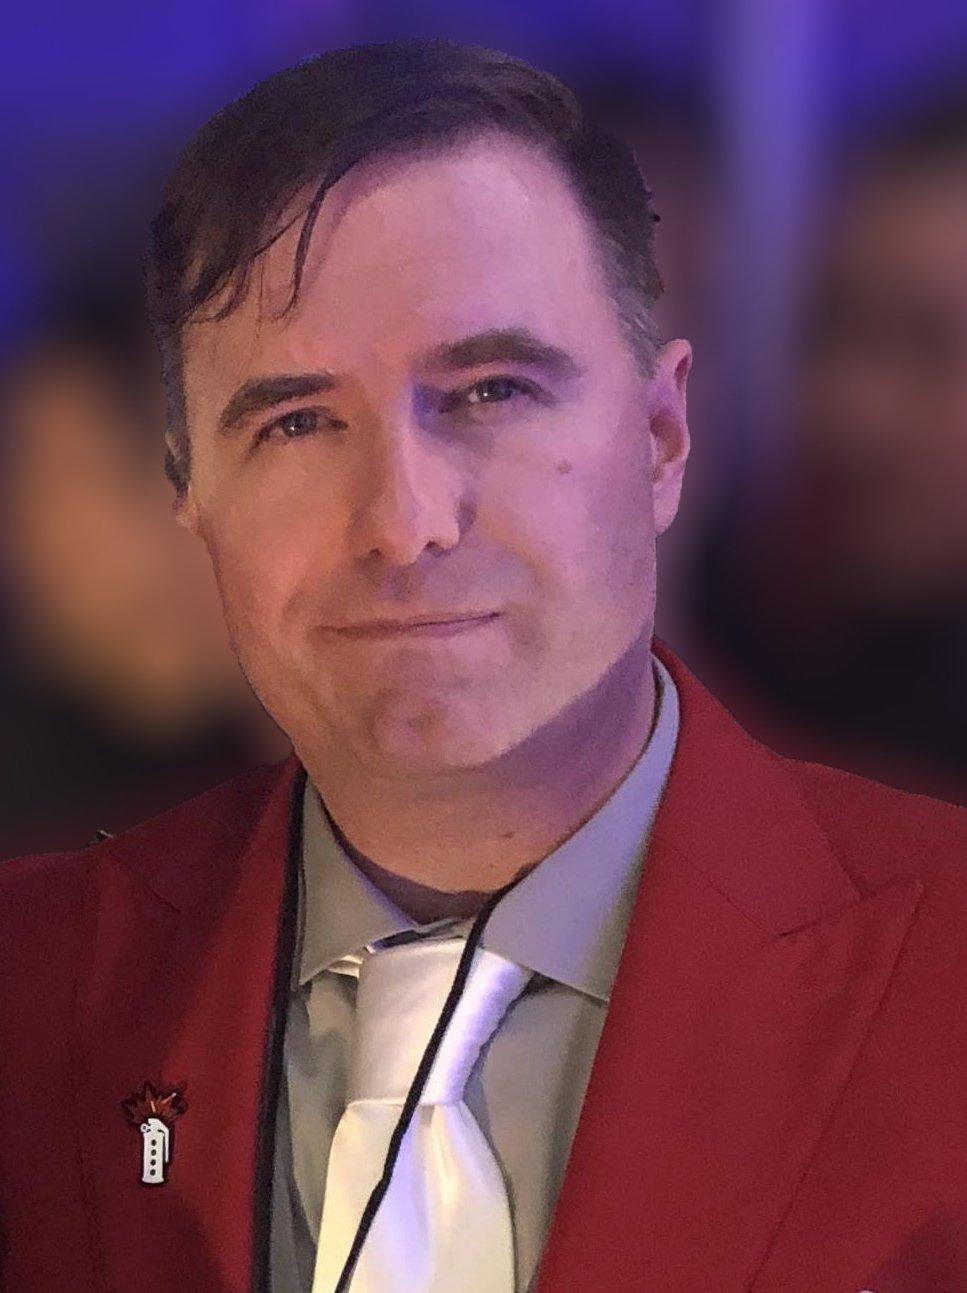 Stephen Machuga Shanghai Six - 2021 Invisible Heroes Award - Invisible Disabilities Association